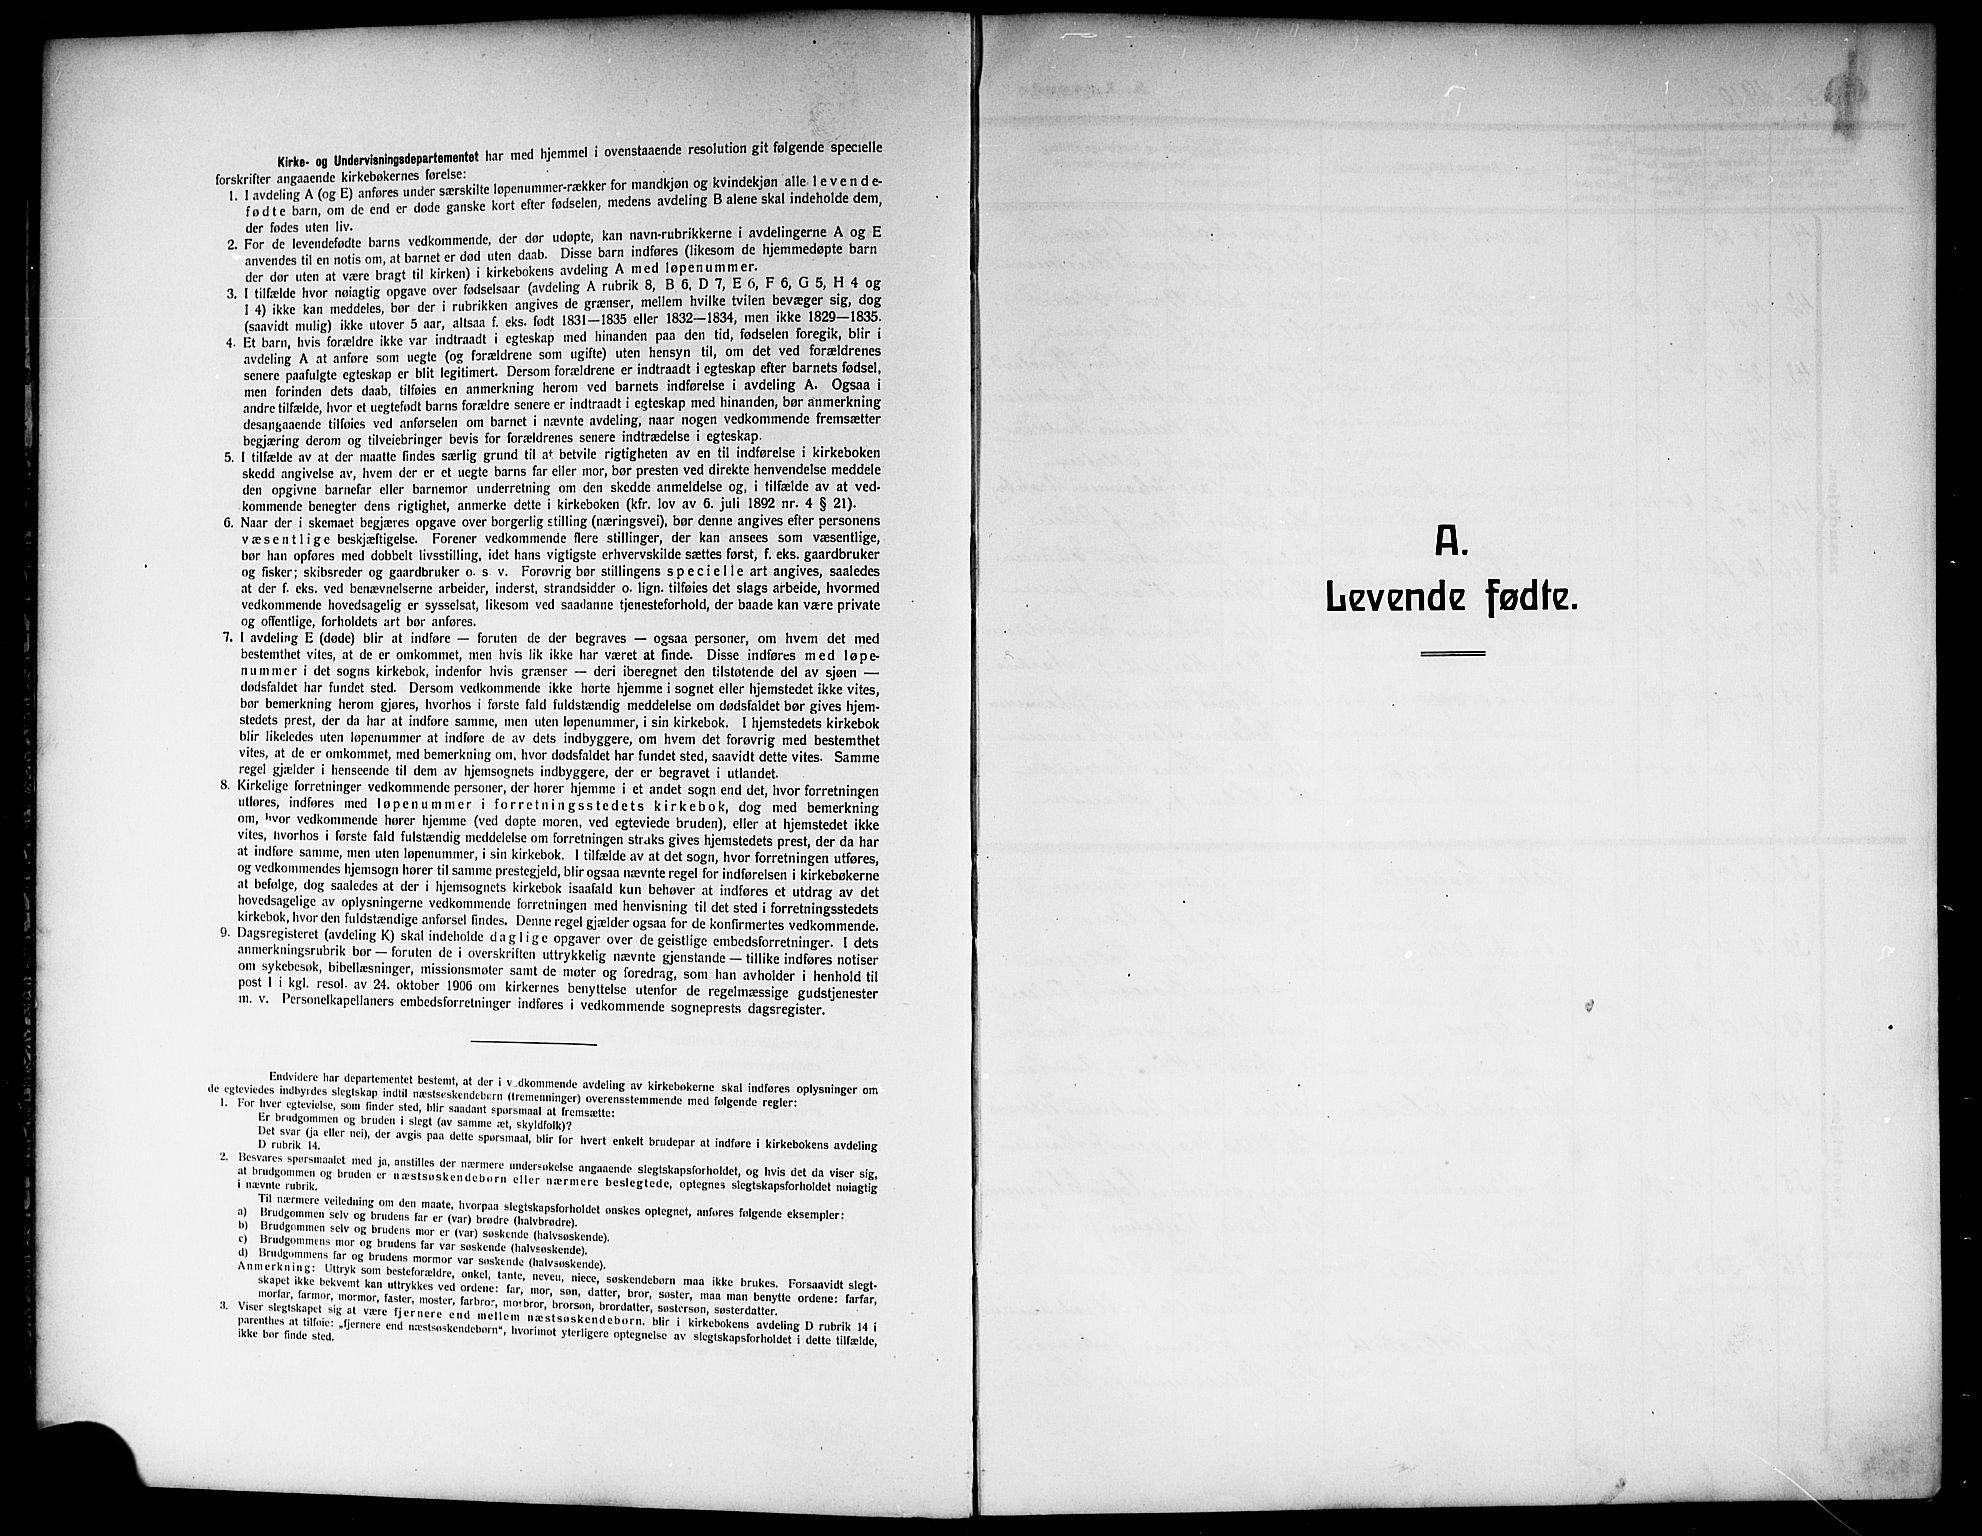 SAKO, Skien kirkebøker, G/Ga/L0009: Klokkerbok nr. 9, 1910-1920